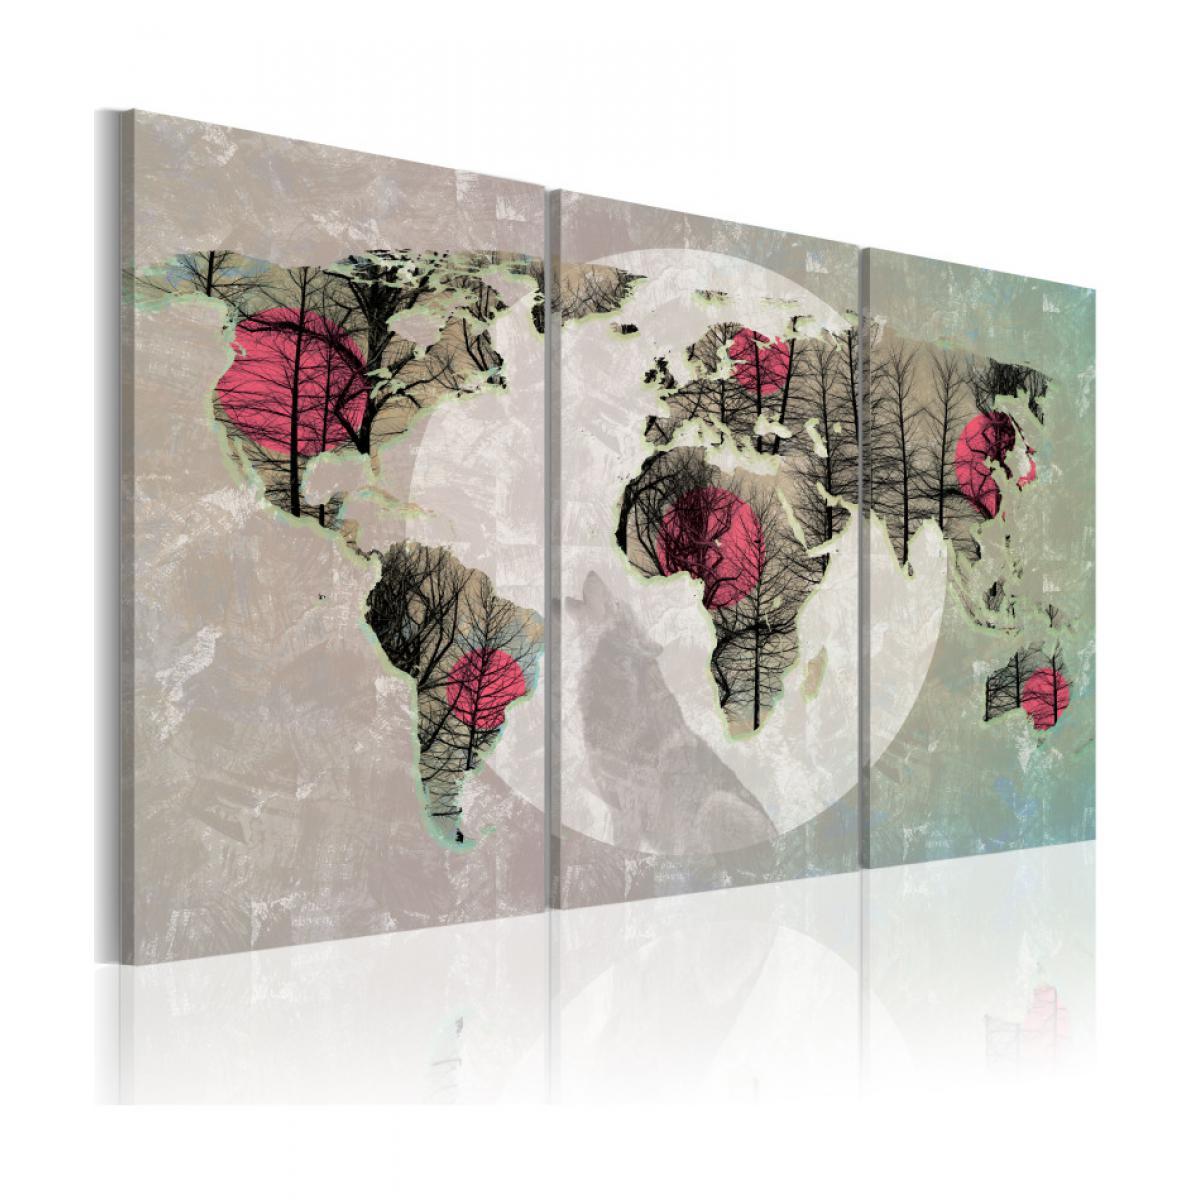 Artgeist Tableau - Carte du Monde: Pleine lune - triptyque 120x80